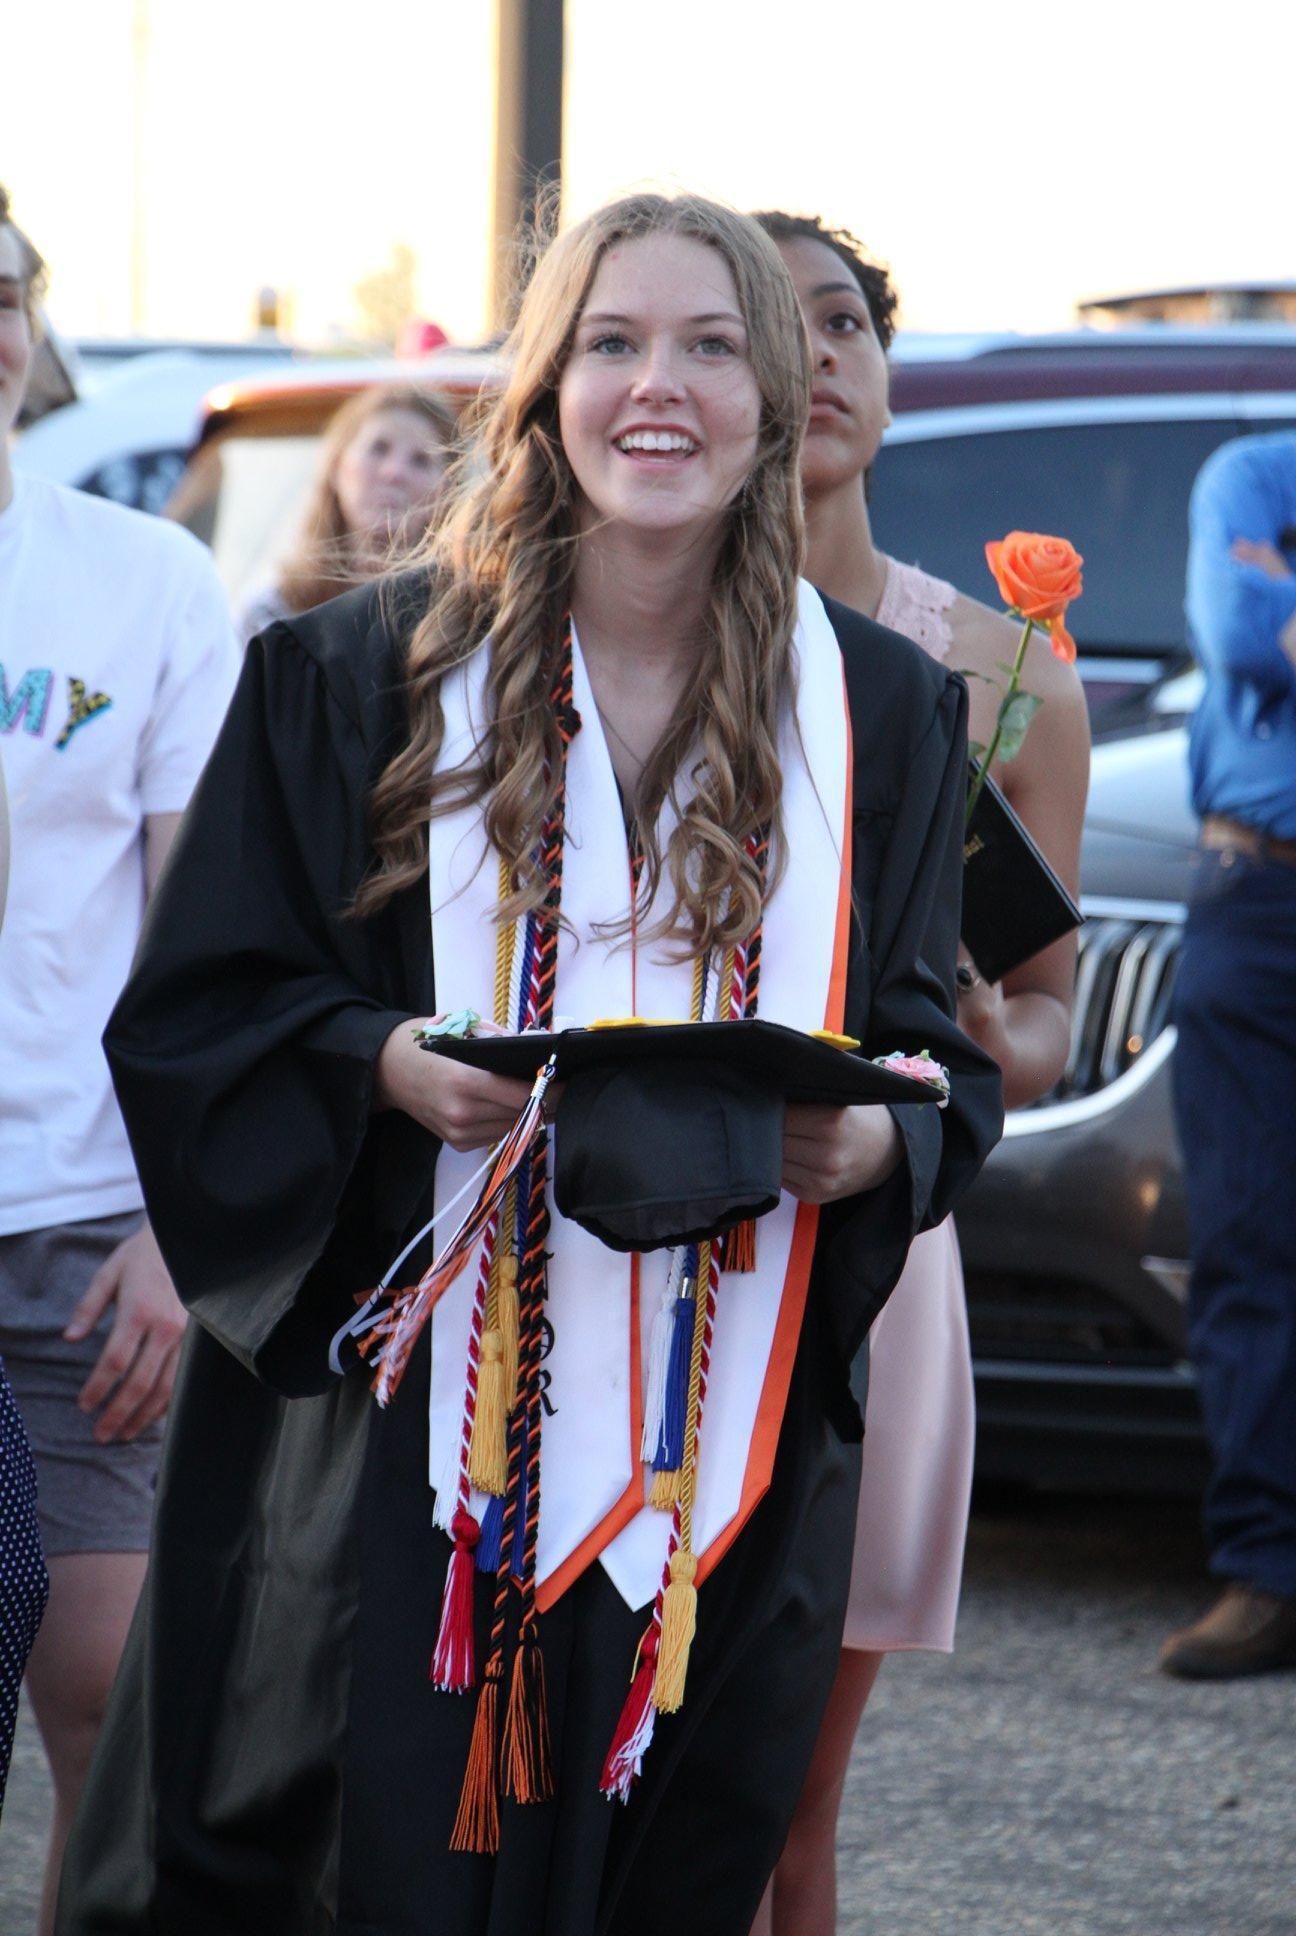 Girl at high school graduation